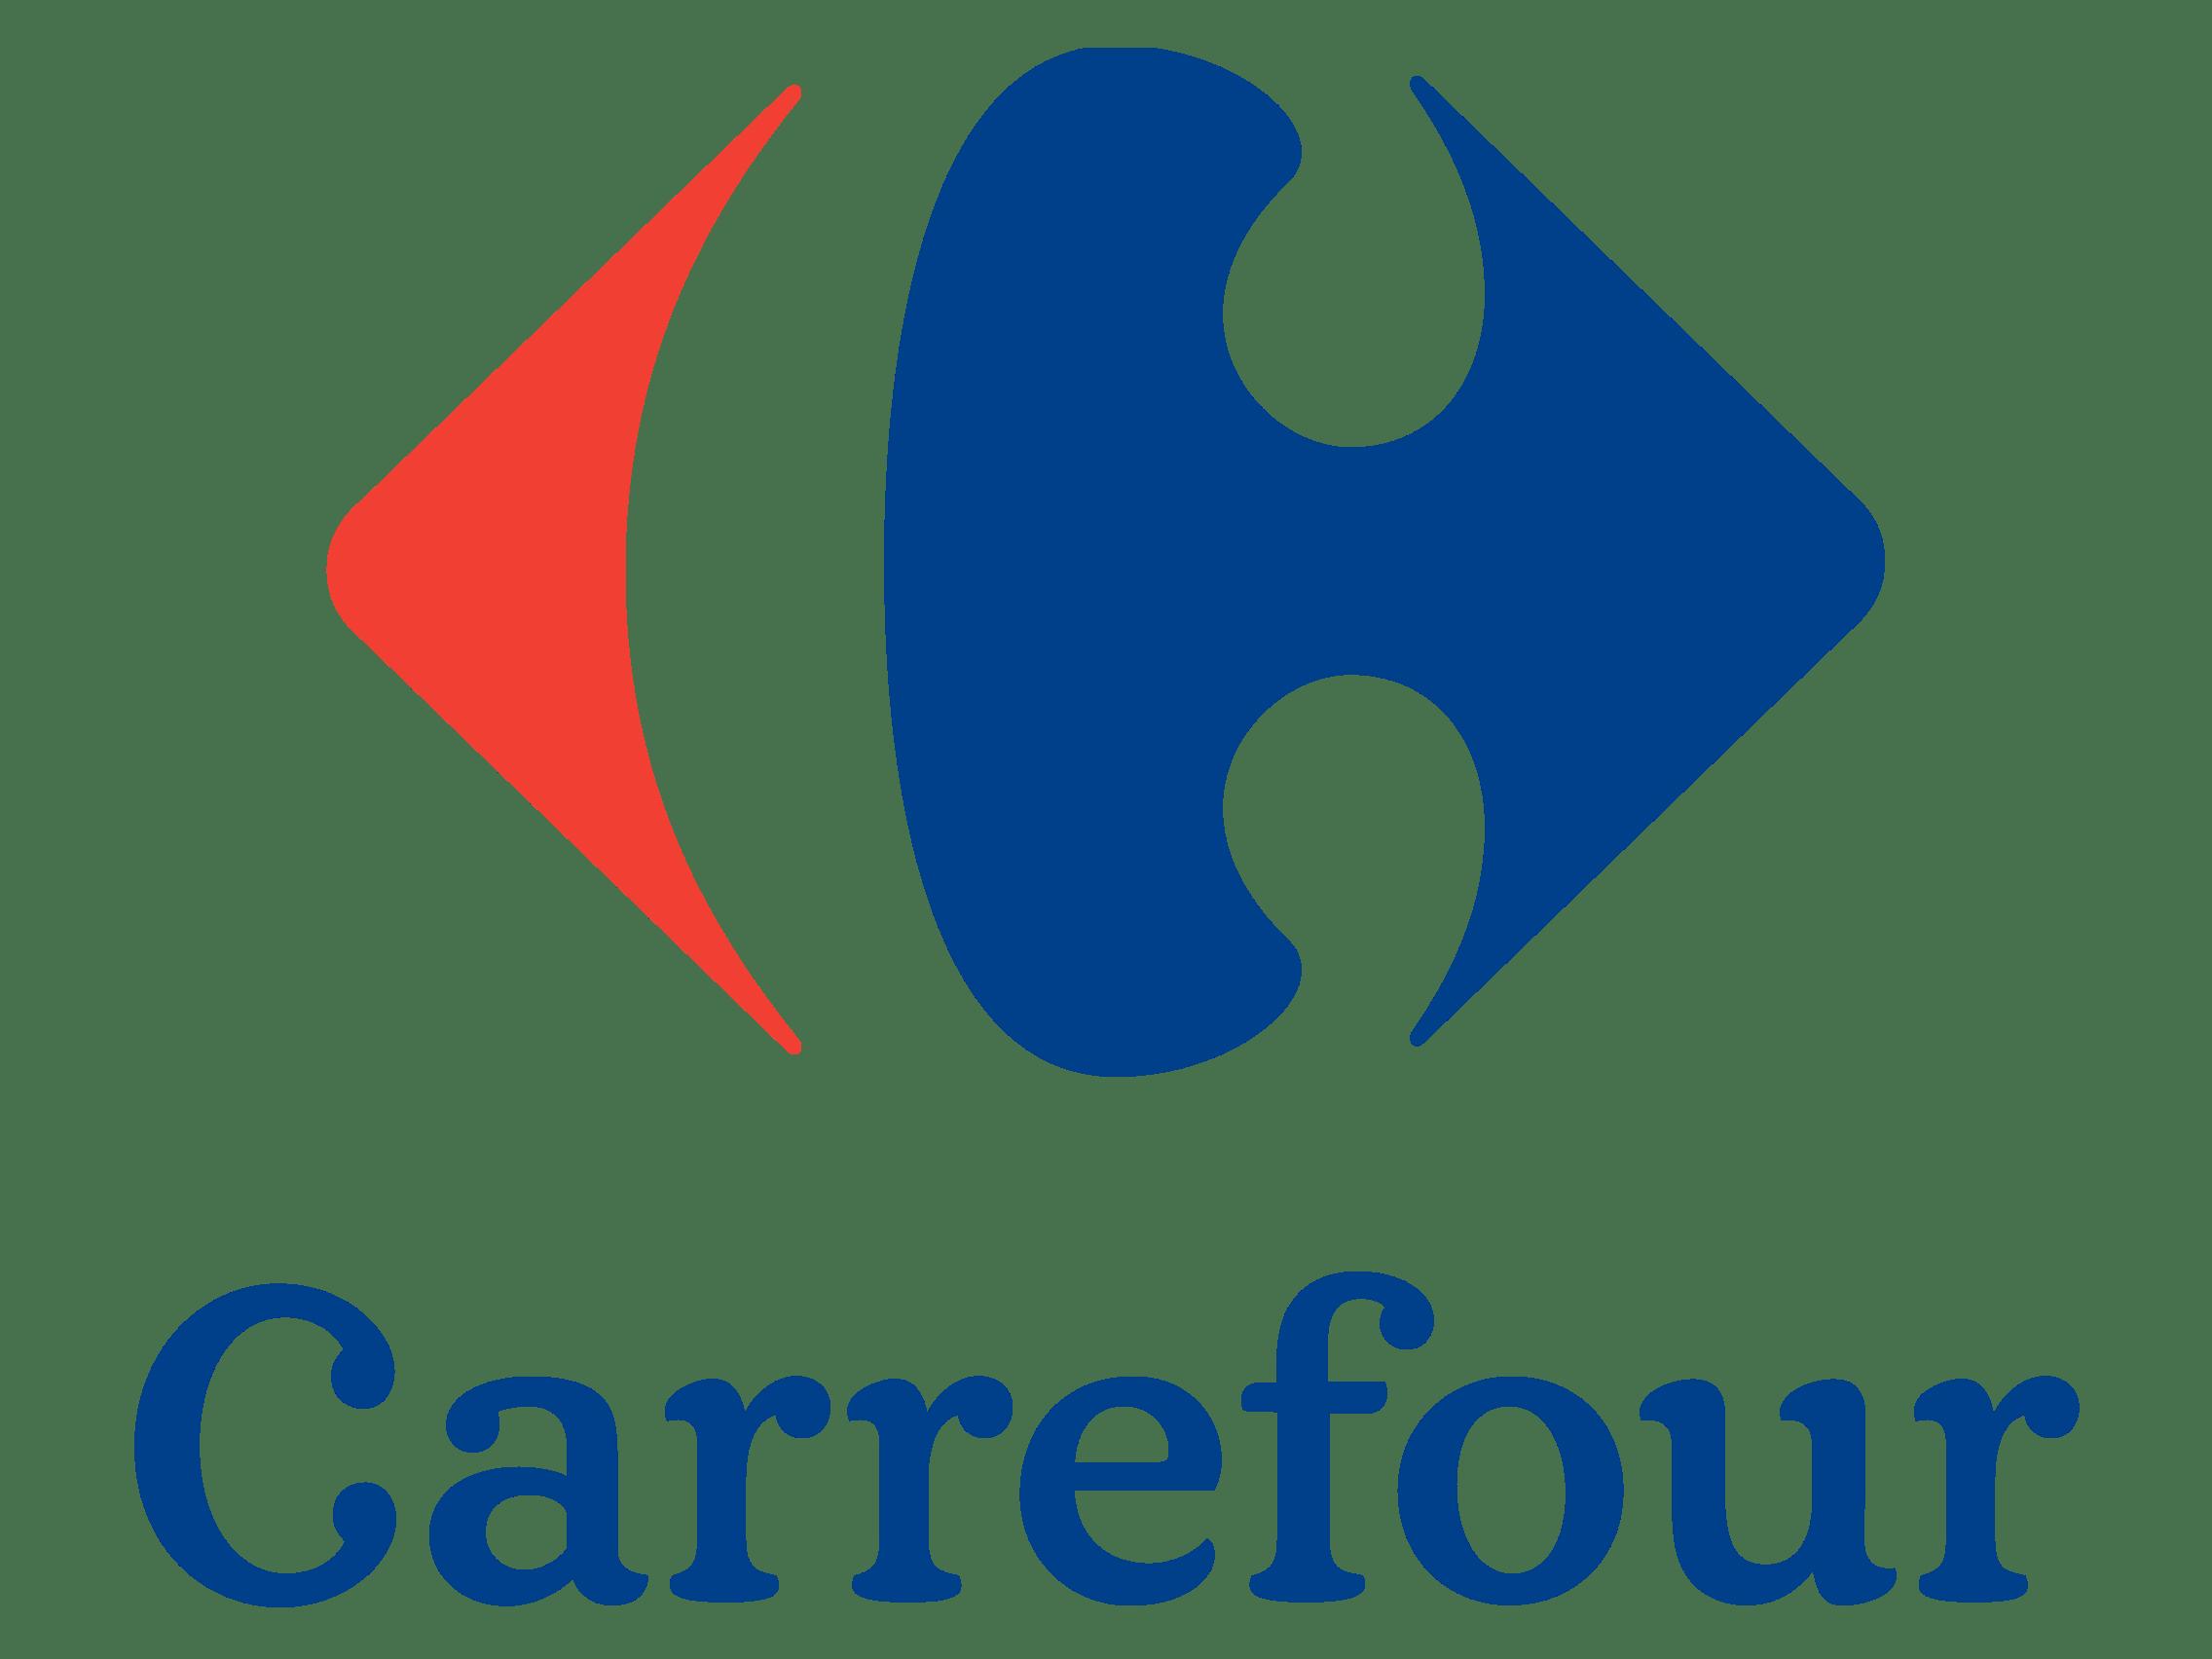 Carrefour Logo transparent PNG.